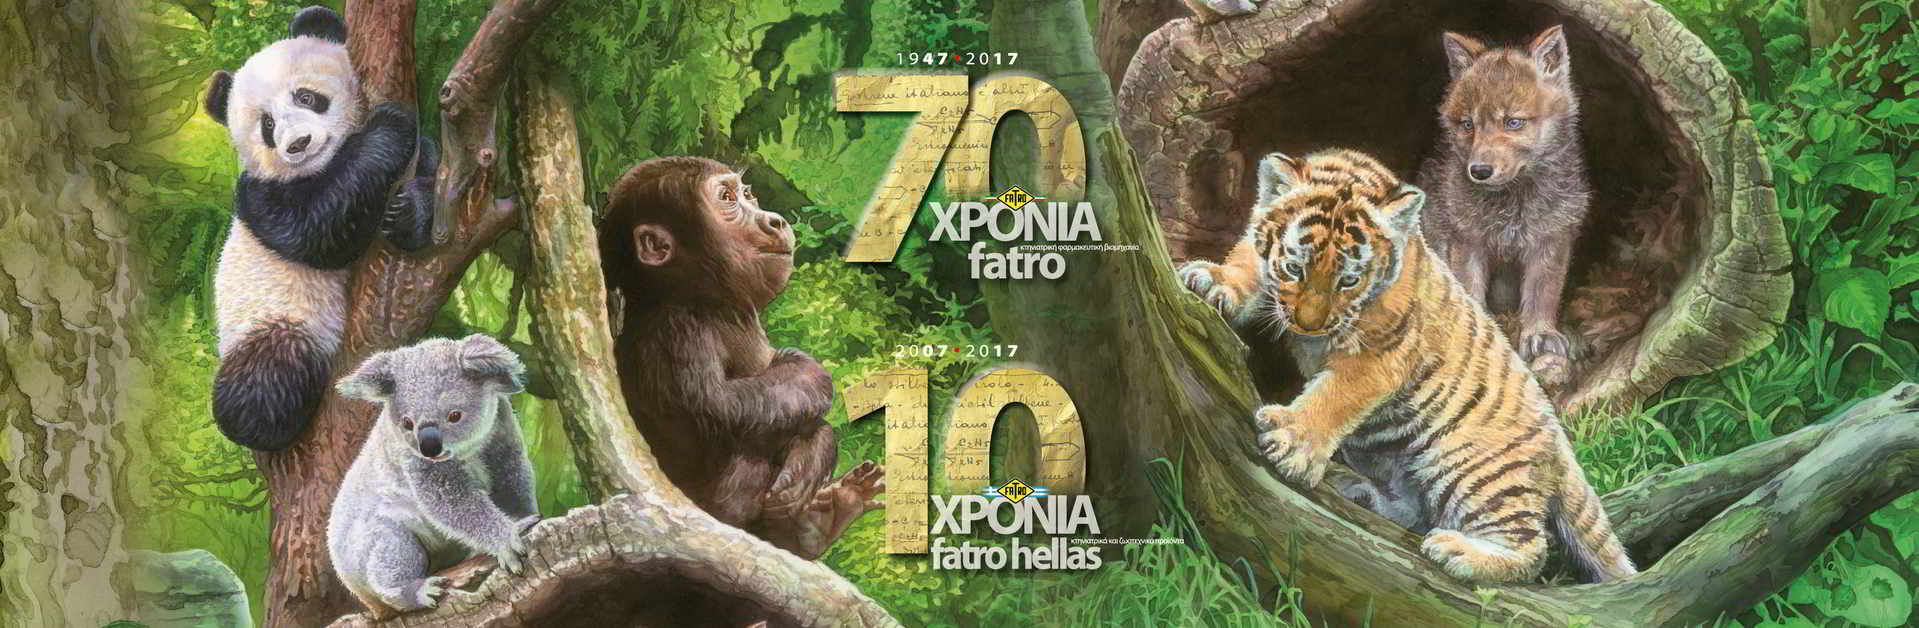 slide grecia Italia - Προϊόντων για την ανάπτυξη, την πρόληψη και την θεραπεία των ζώων - fatro hellas